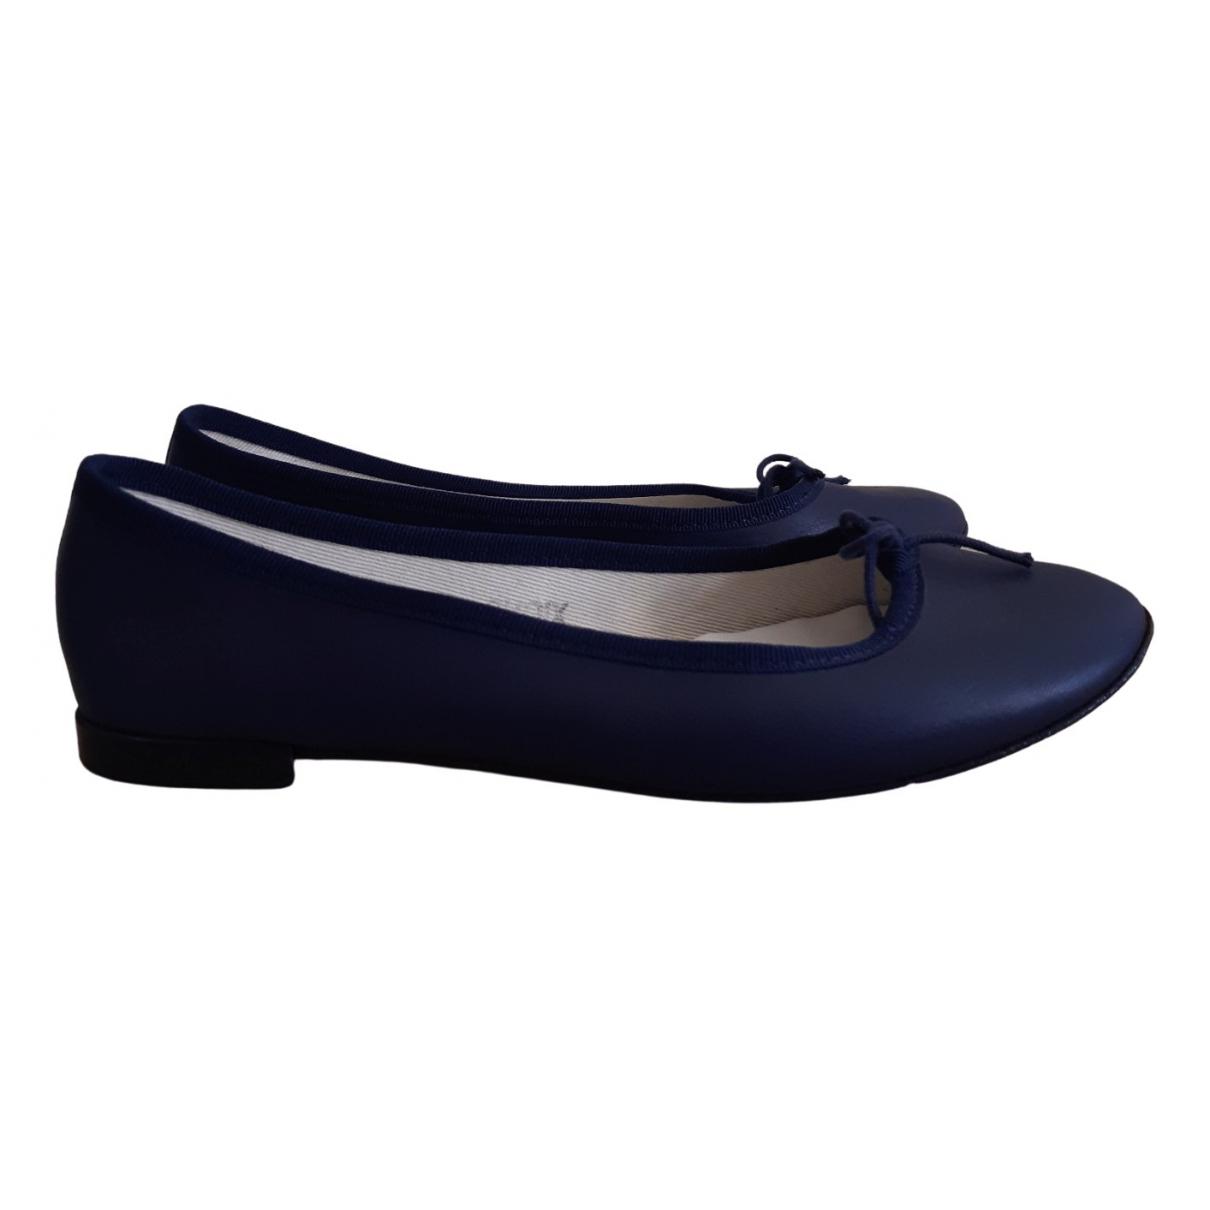 Repetto \N Ballerinas in  Blau Leder